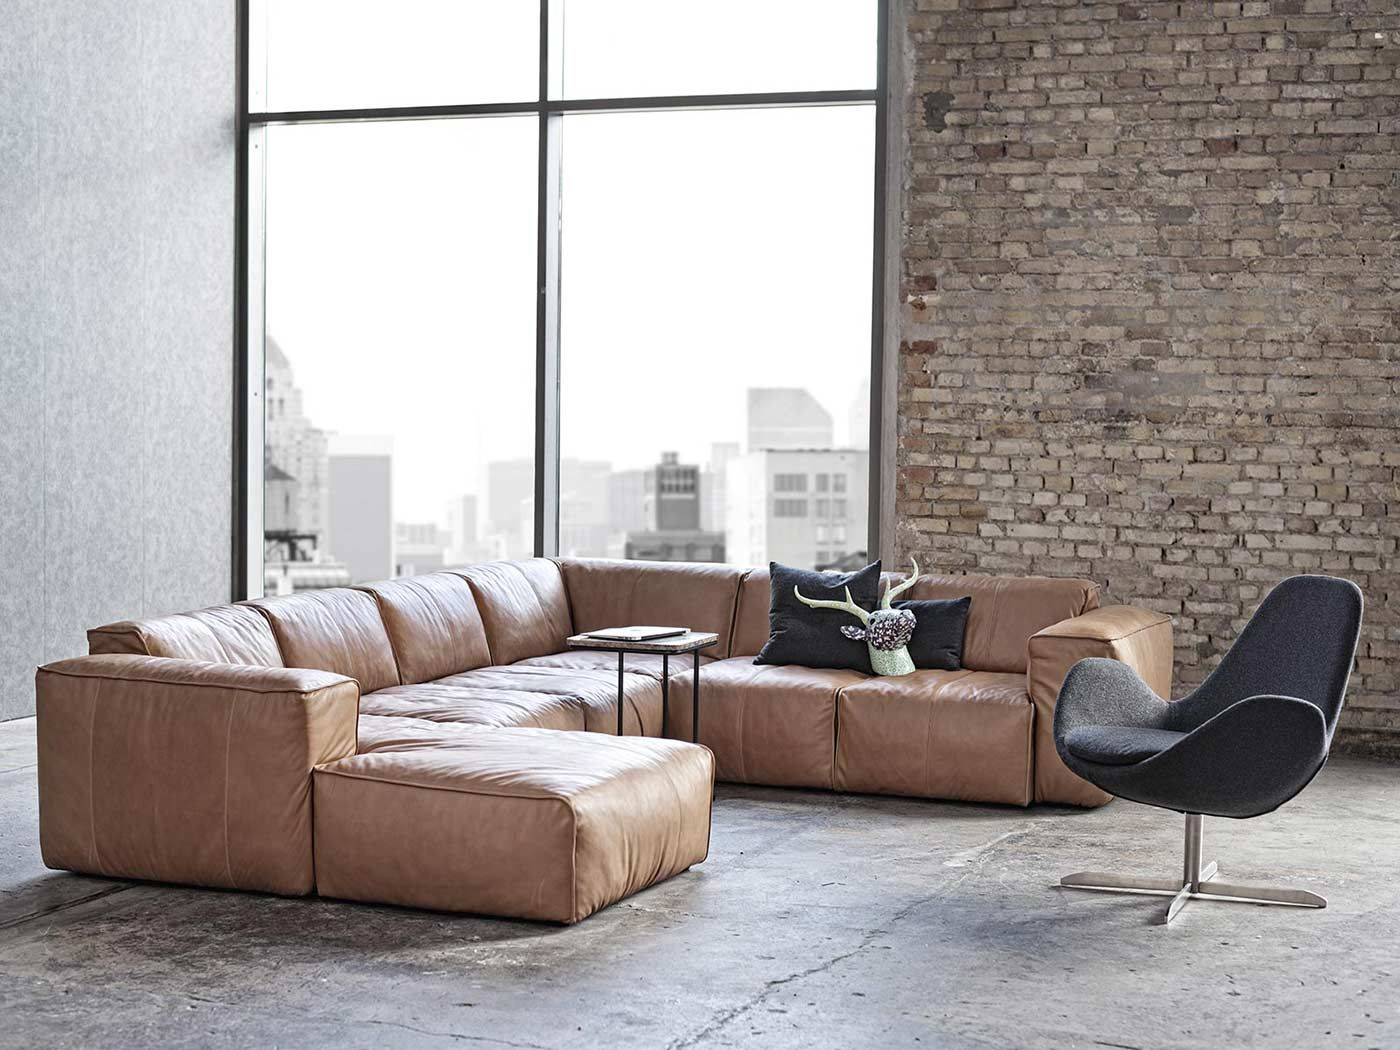 theca - sofas fresno | products | pinterest | cosy corner, cosy